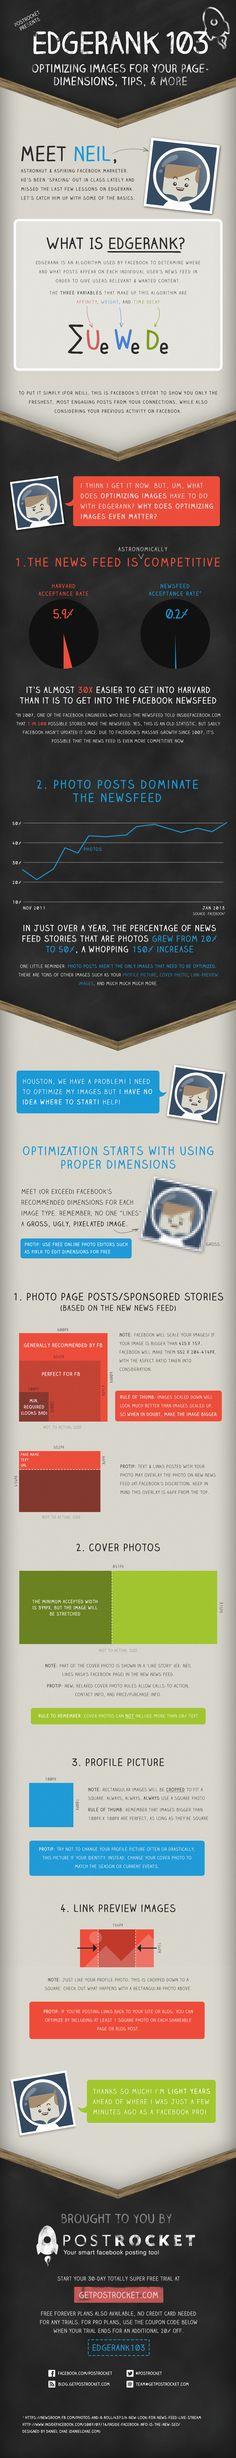 Optimaze your images to increase your Facebook Edgerank | Ezlearning AcademyEzlearning Academy